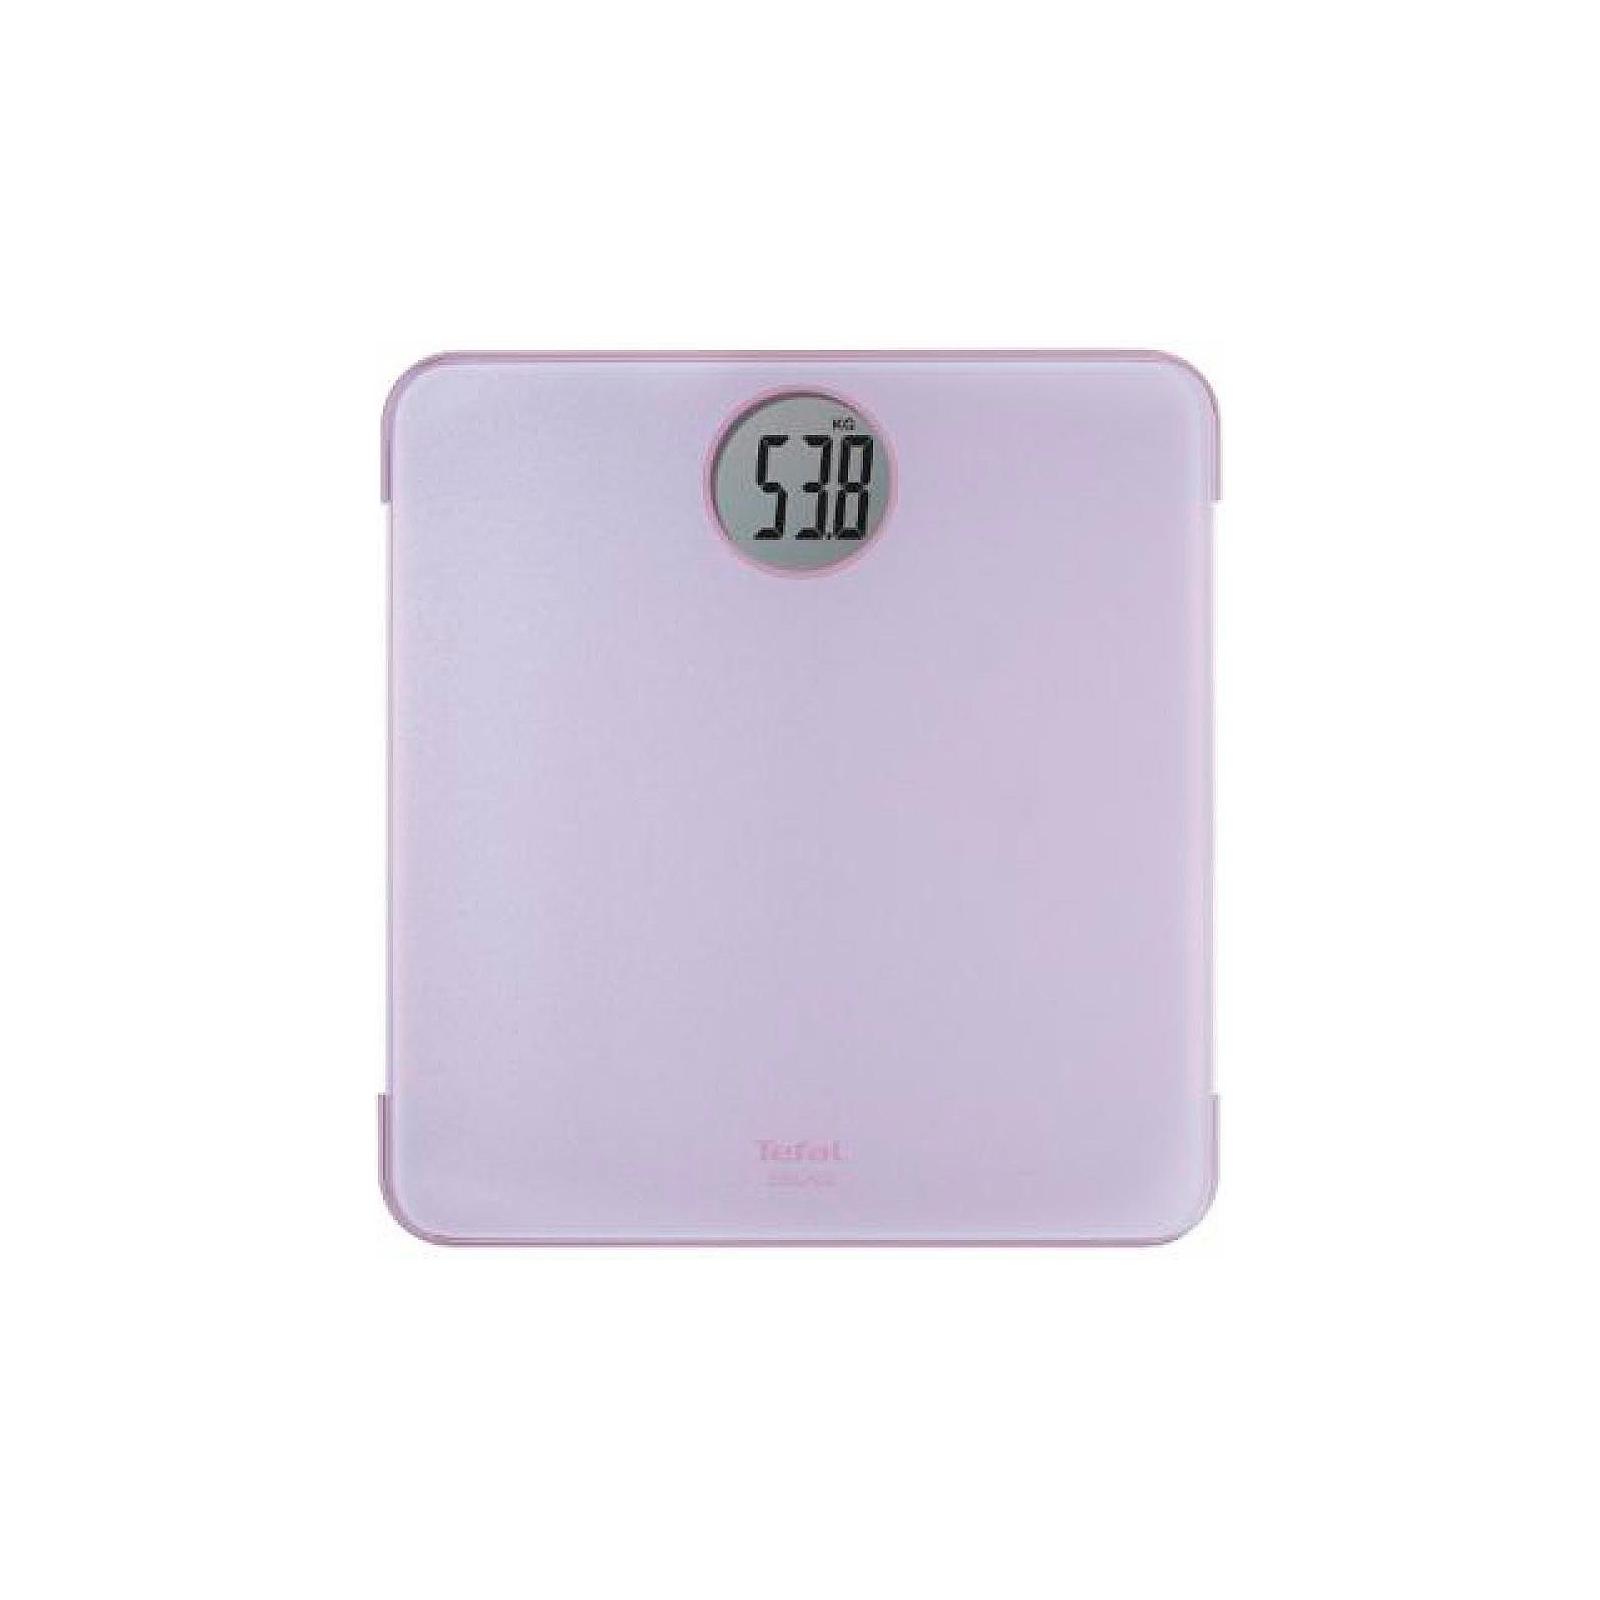 Весы напольные TEFAL PP1201 (PP1201 V0)